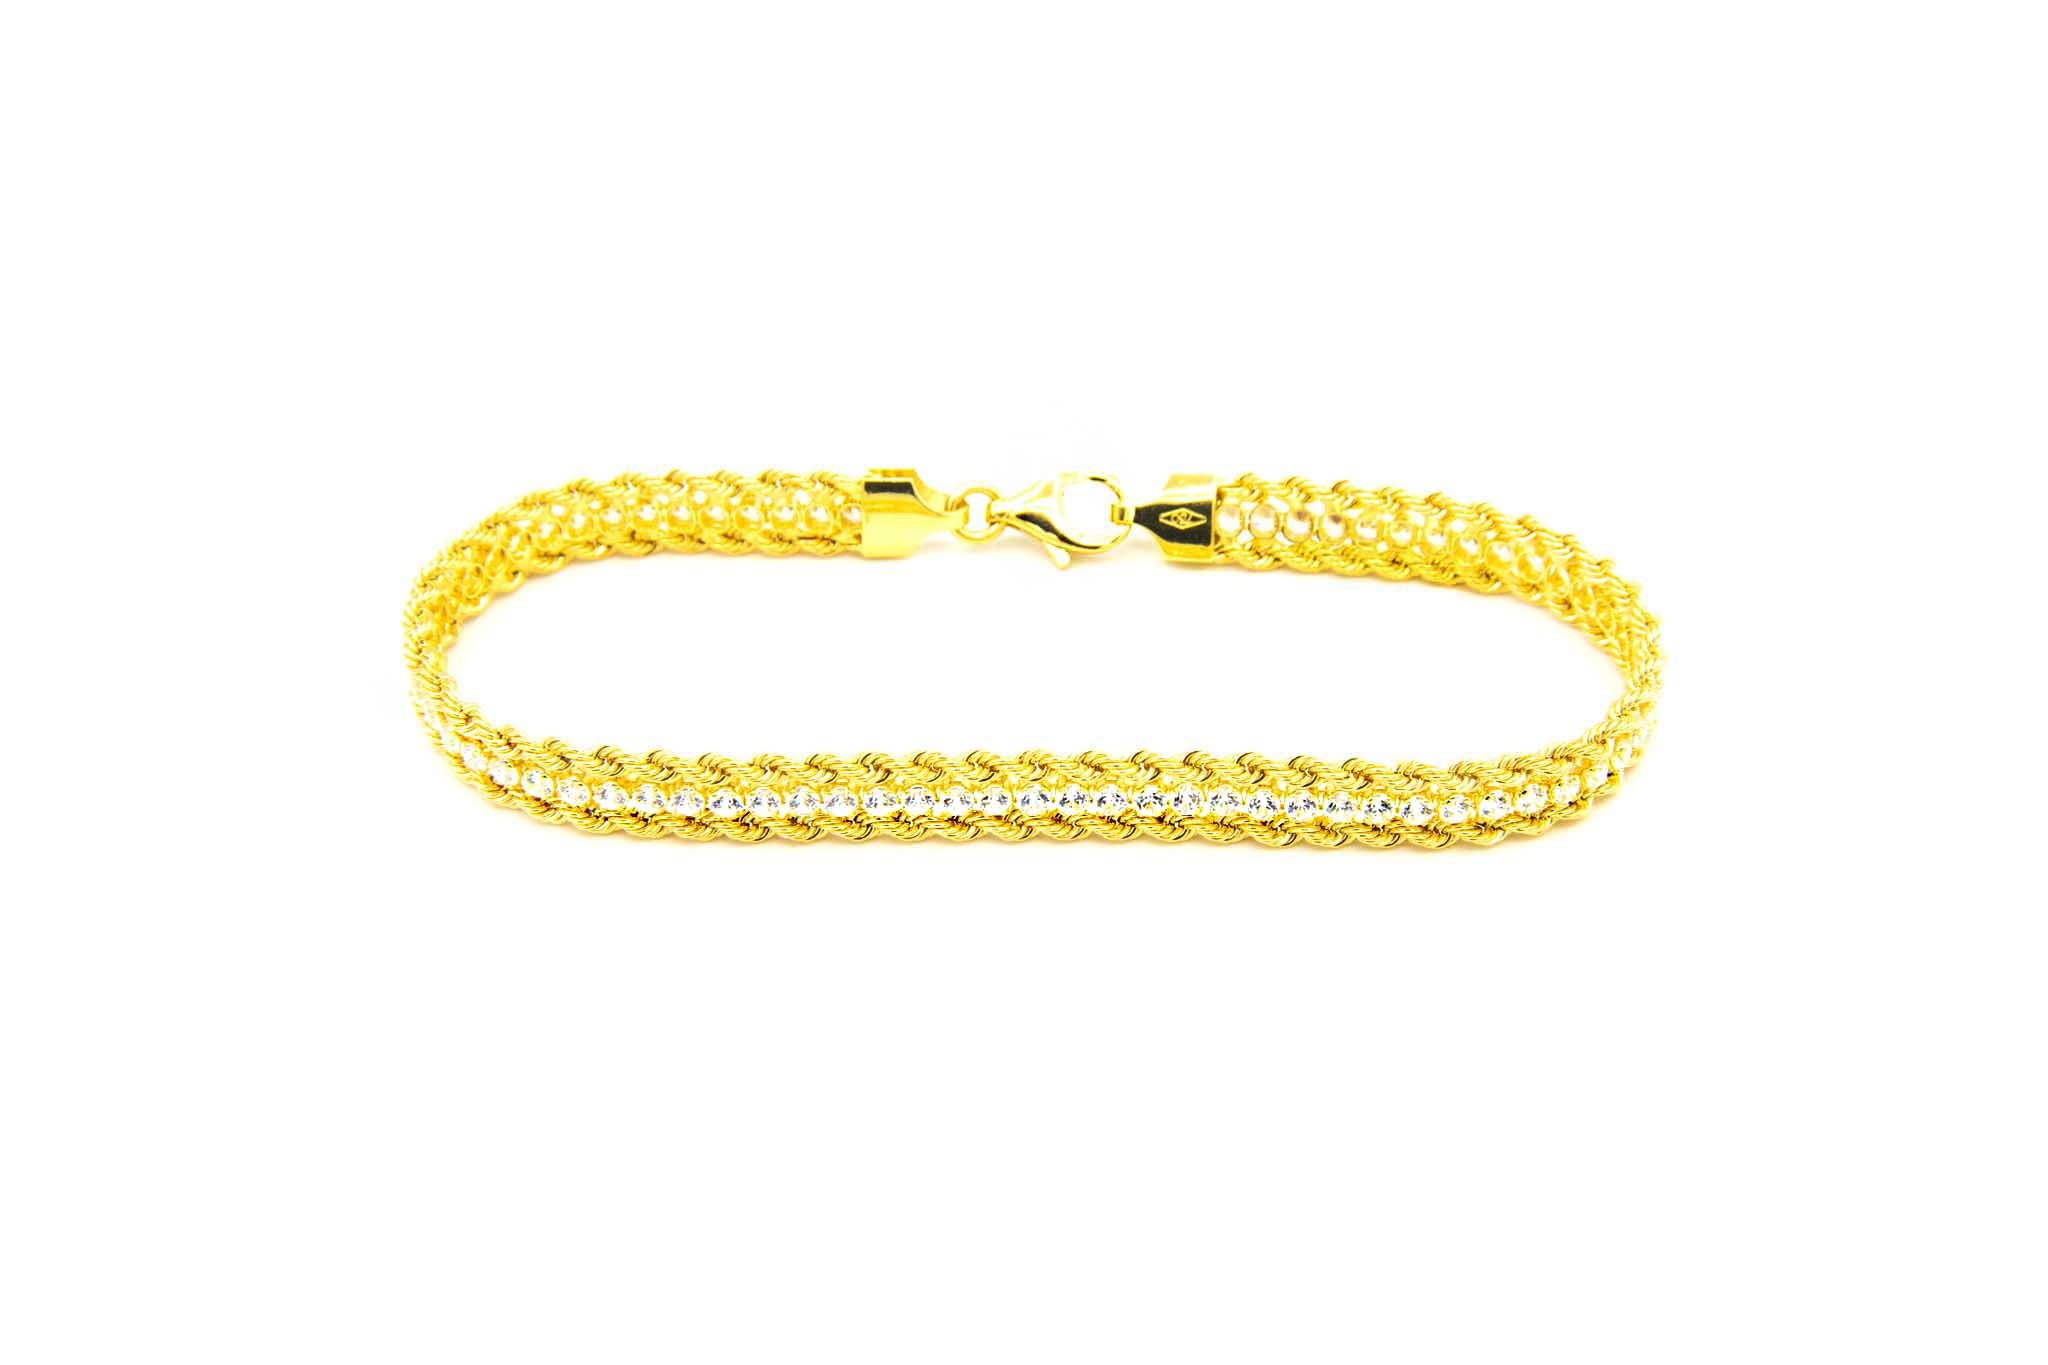 Armband dubbele rope chain met zirkonia's ertussen-2